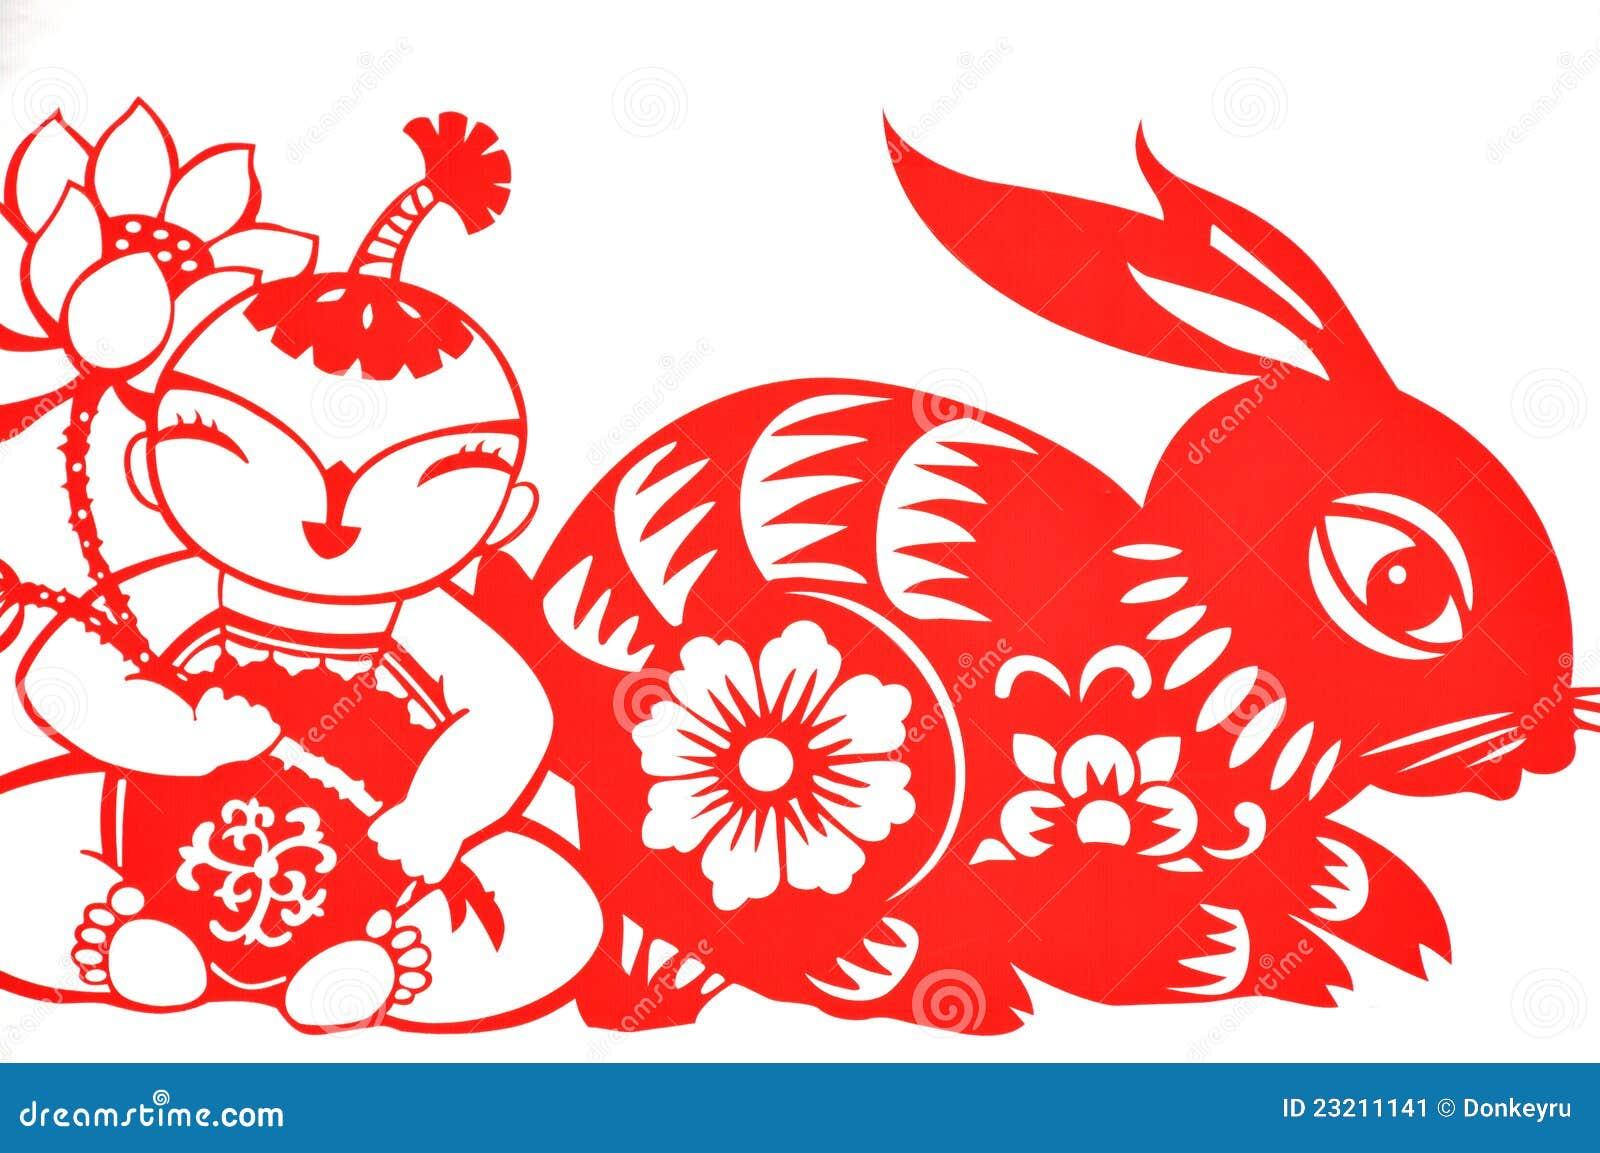 essay on spring festival The basant kite festival of punjab has been a historic spring time kite flying event during the basant panchami festival in the punjab region in india and pakistan it falls on basant, also called basant panchami punjabi: ਬਸੰਤ ਪੰਚਮੀ urdu: بسنت پنچمی hindi: बसन्त पञ्चमी) and vasant panchami.